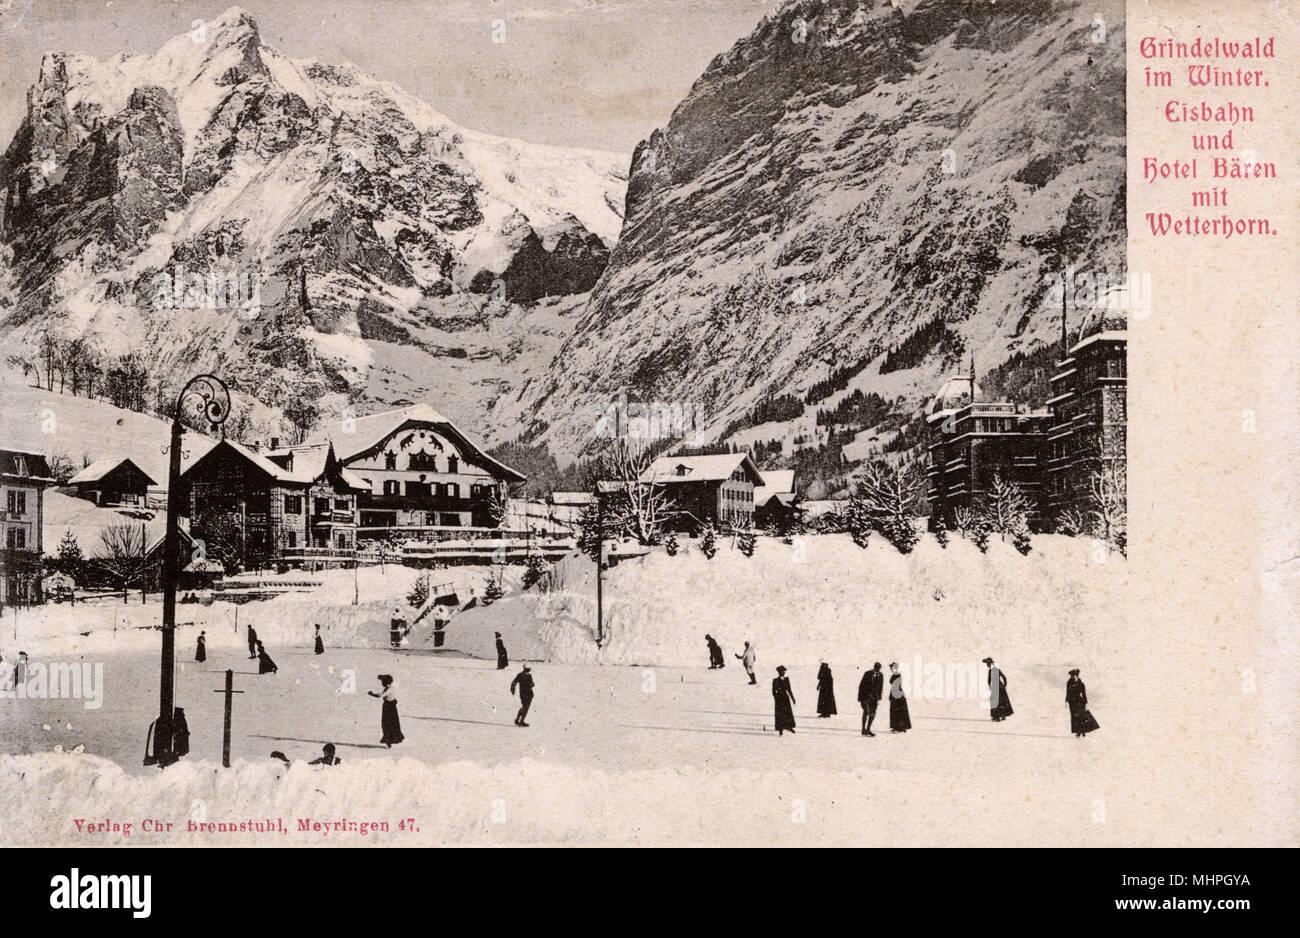 Hotel Baeren (Bears Hotel) and Wetterhorn, Grindelwald, Switzerland.      Date: circa 1905 - Stock Image